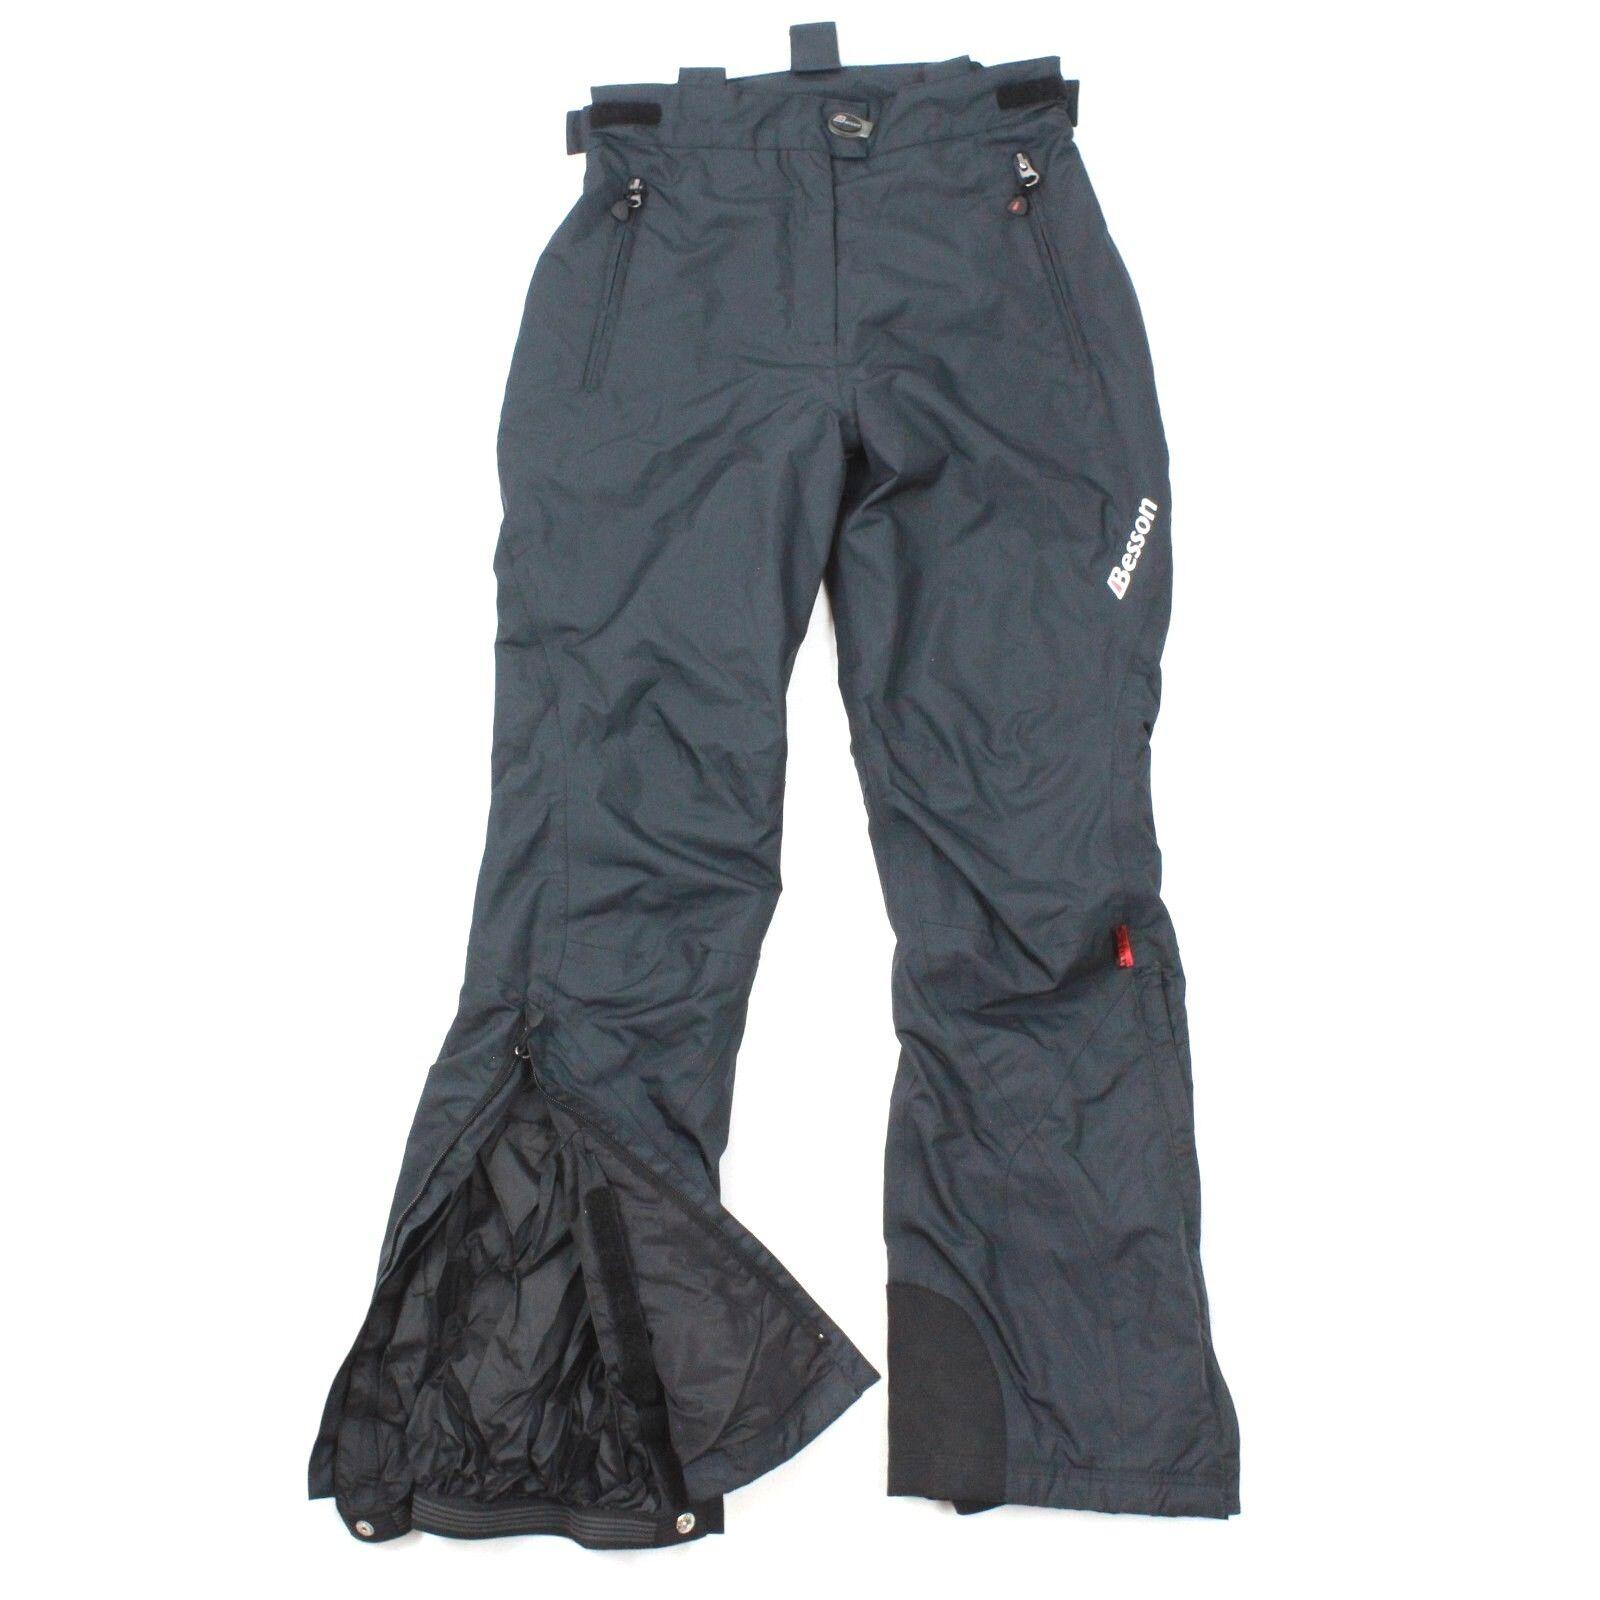 Anzi Besson Snowboard Snow Pants HiTEX 5000 XS Waterproof Nylon  Snowma ne  242  low prices